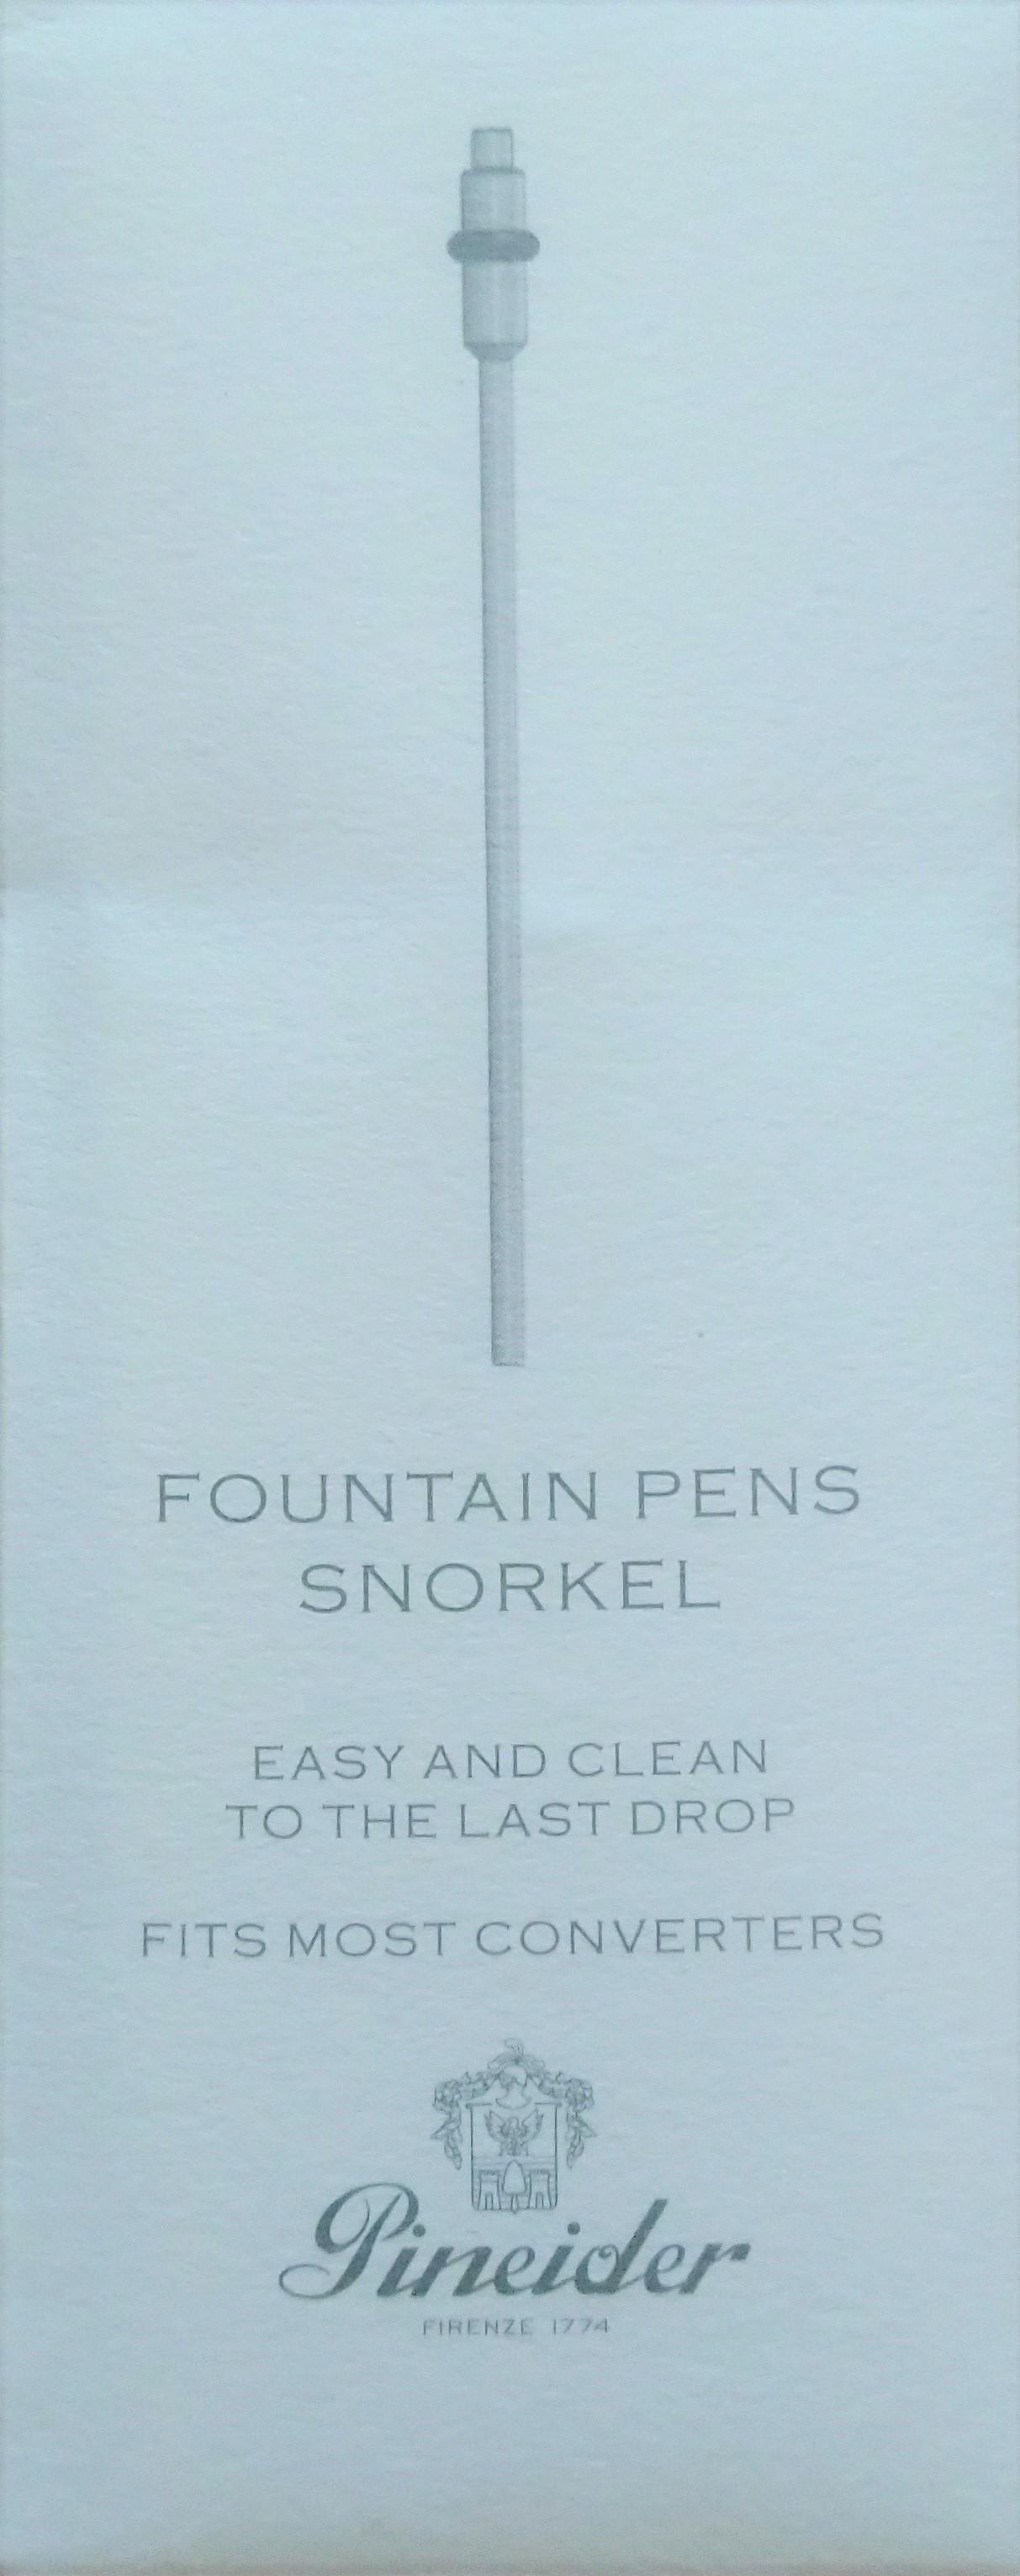 Pineider Fountain Pen Snorkel